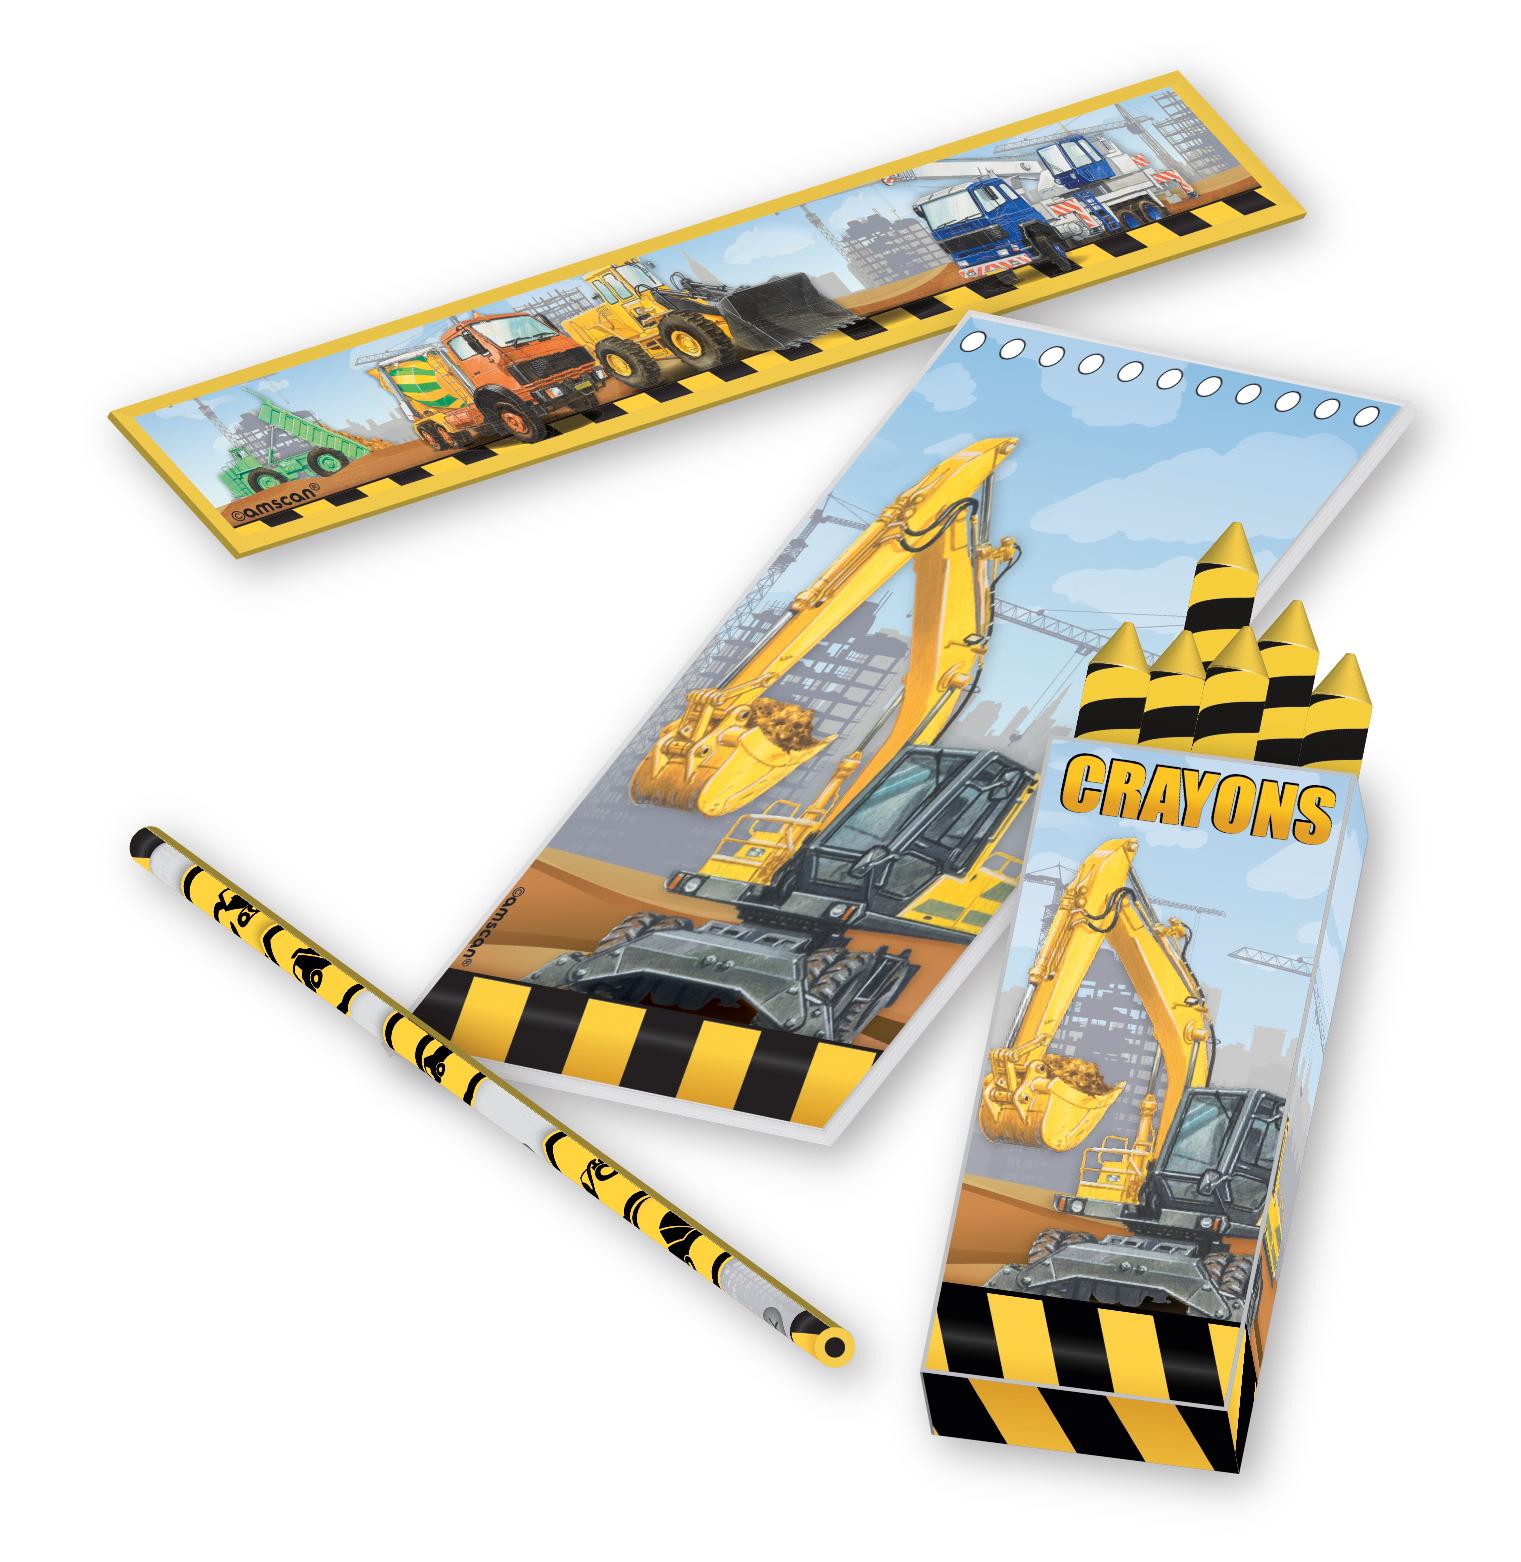 // Baustellen-Party Construction Stationary Favor Set 998336--